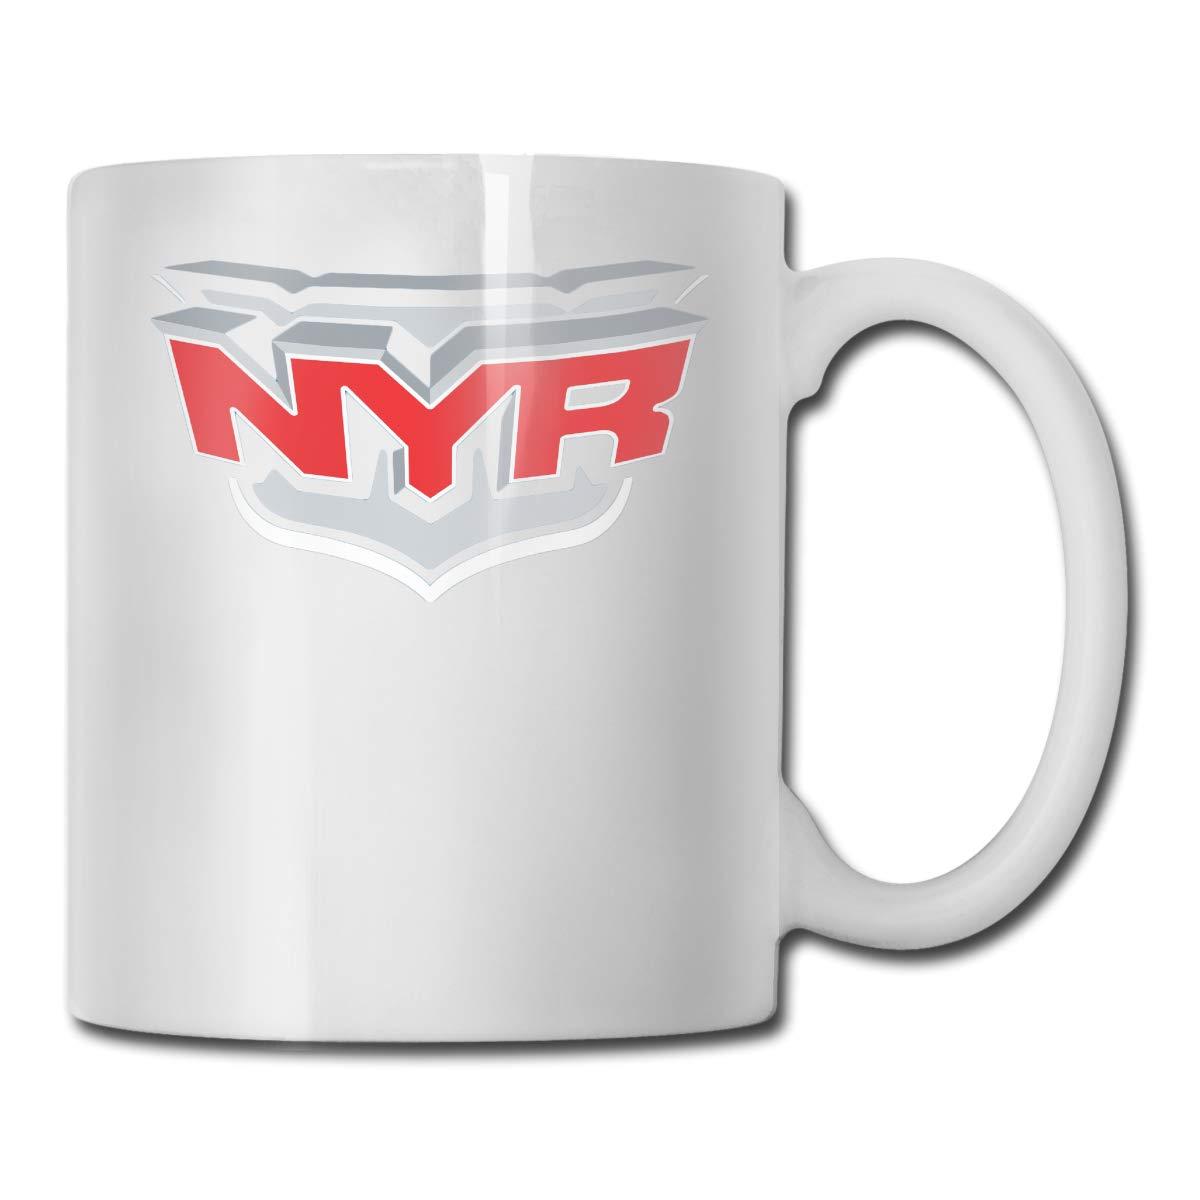 White One Size Office Coffee Cup MajseticNewYorkRangersLogo Geblackus 14.72 OZ Capacity Mug is Perfect for CoffeeWhite